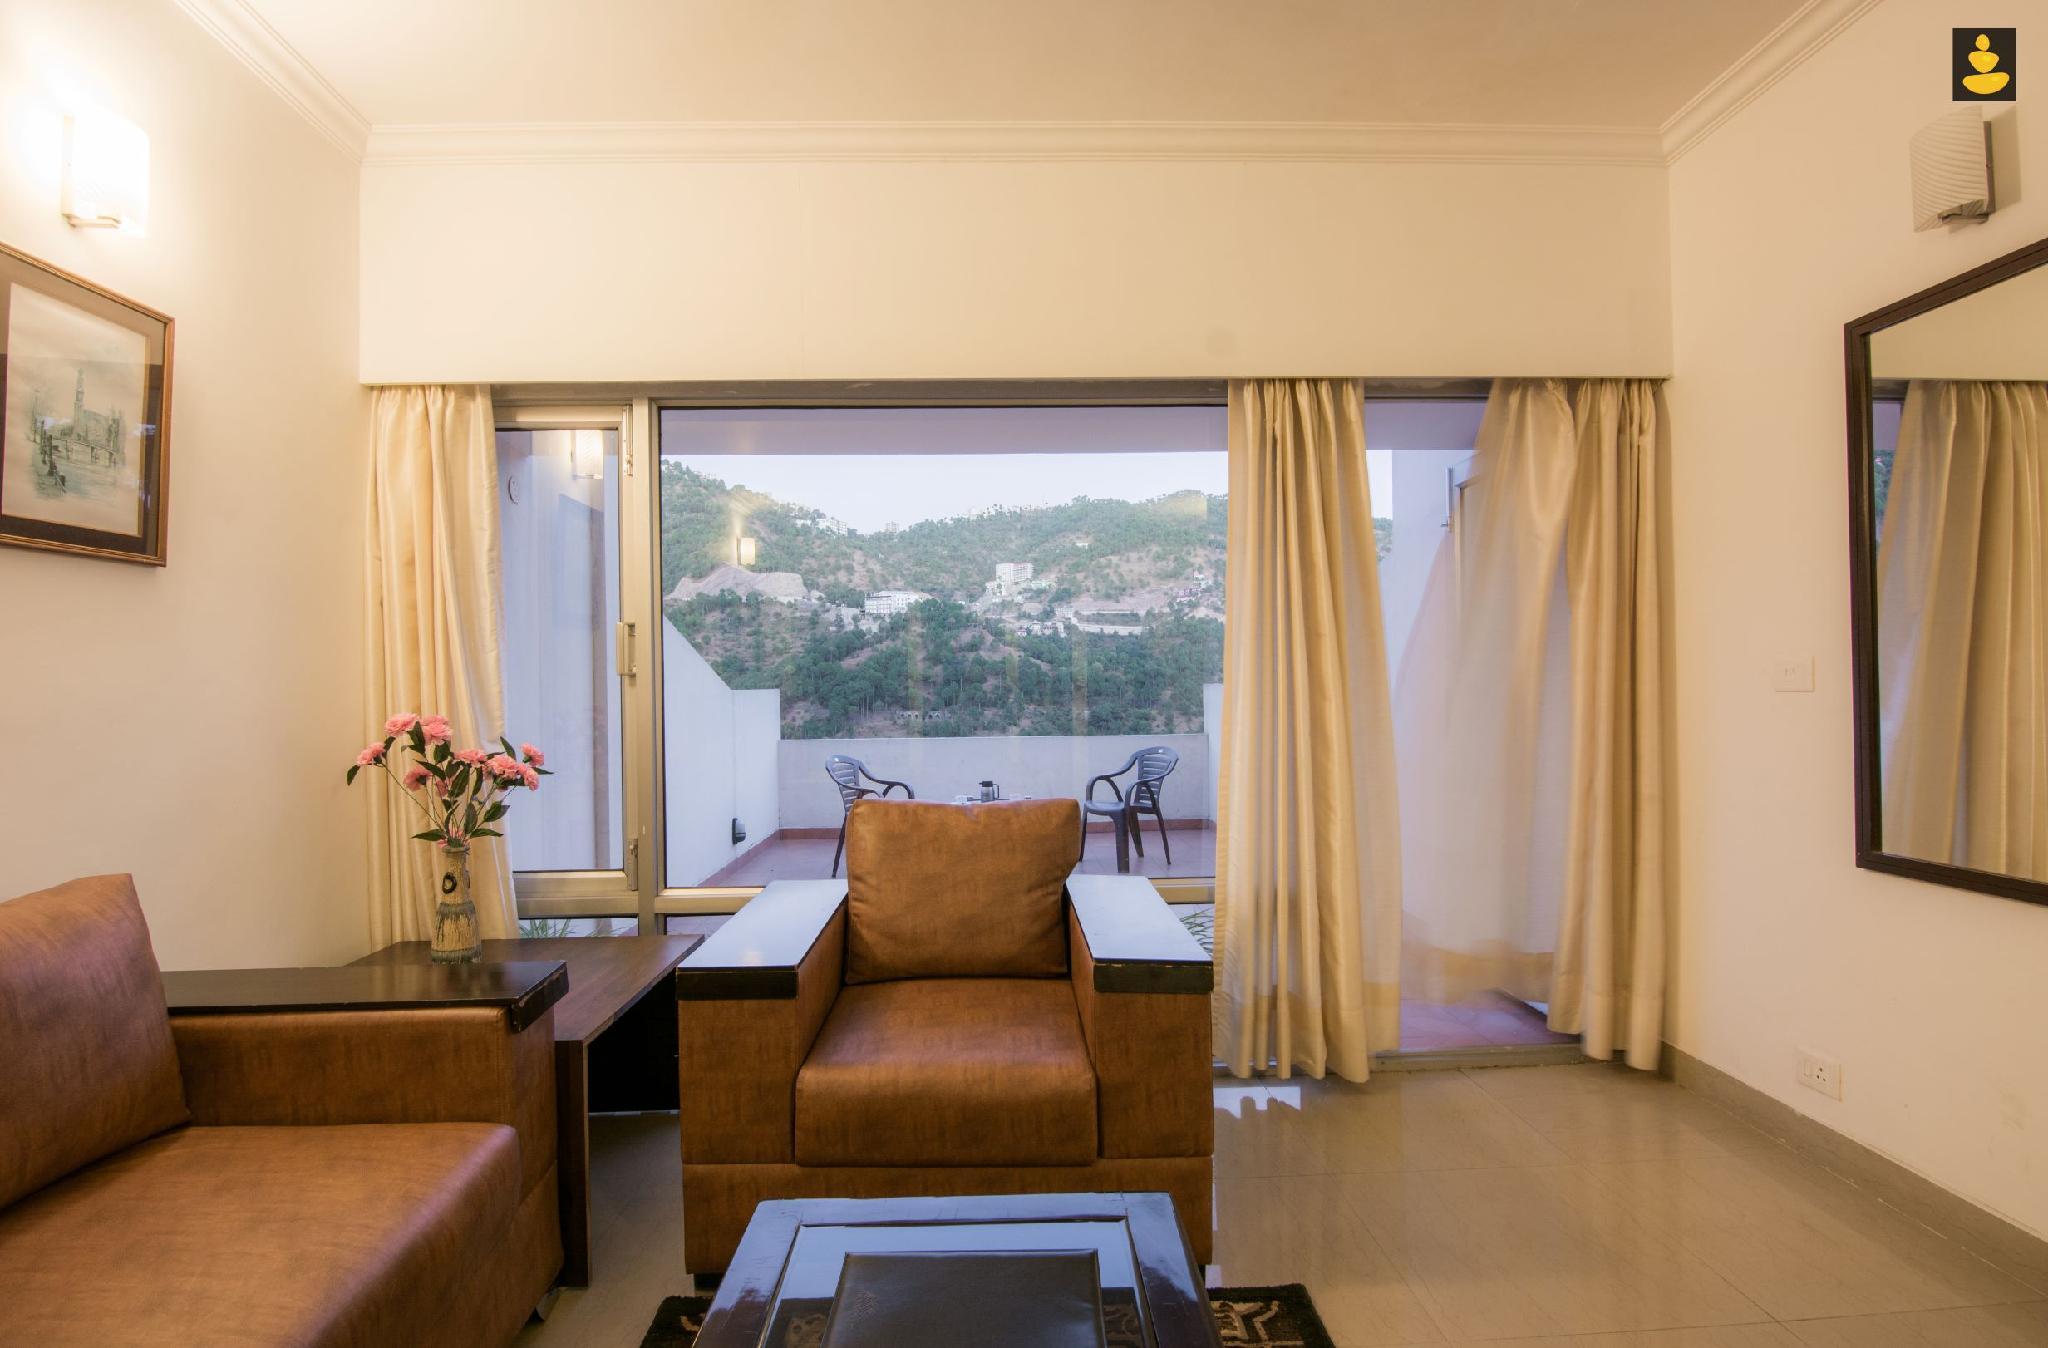 LivingStone  Misty Mountains Resort  Premium Room